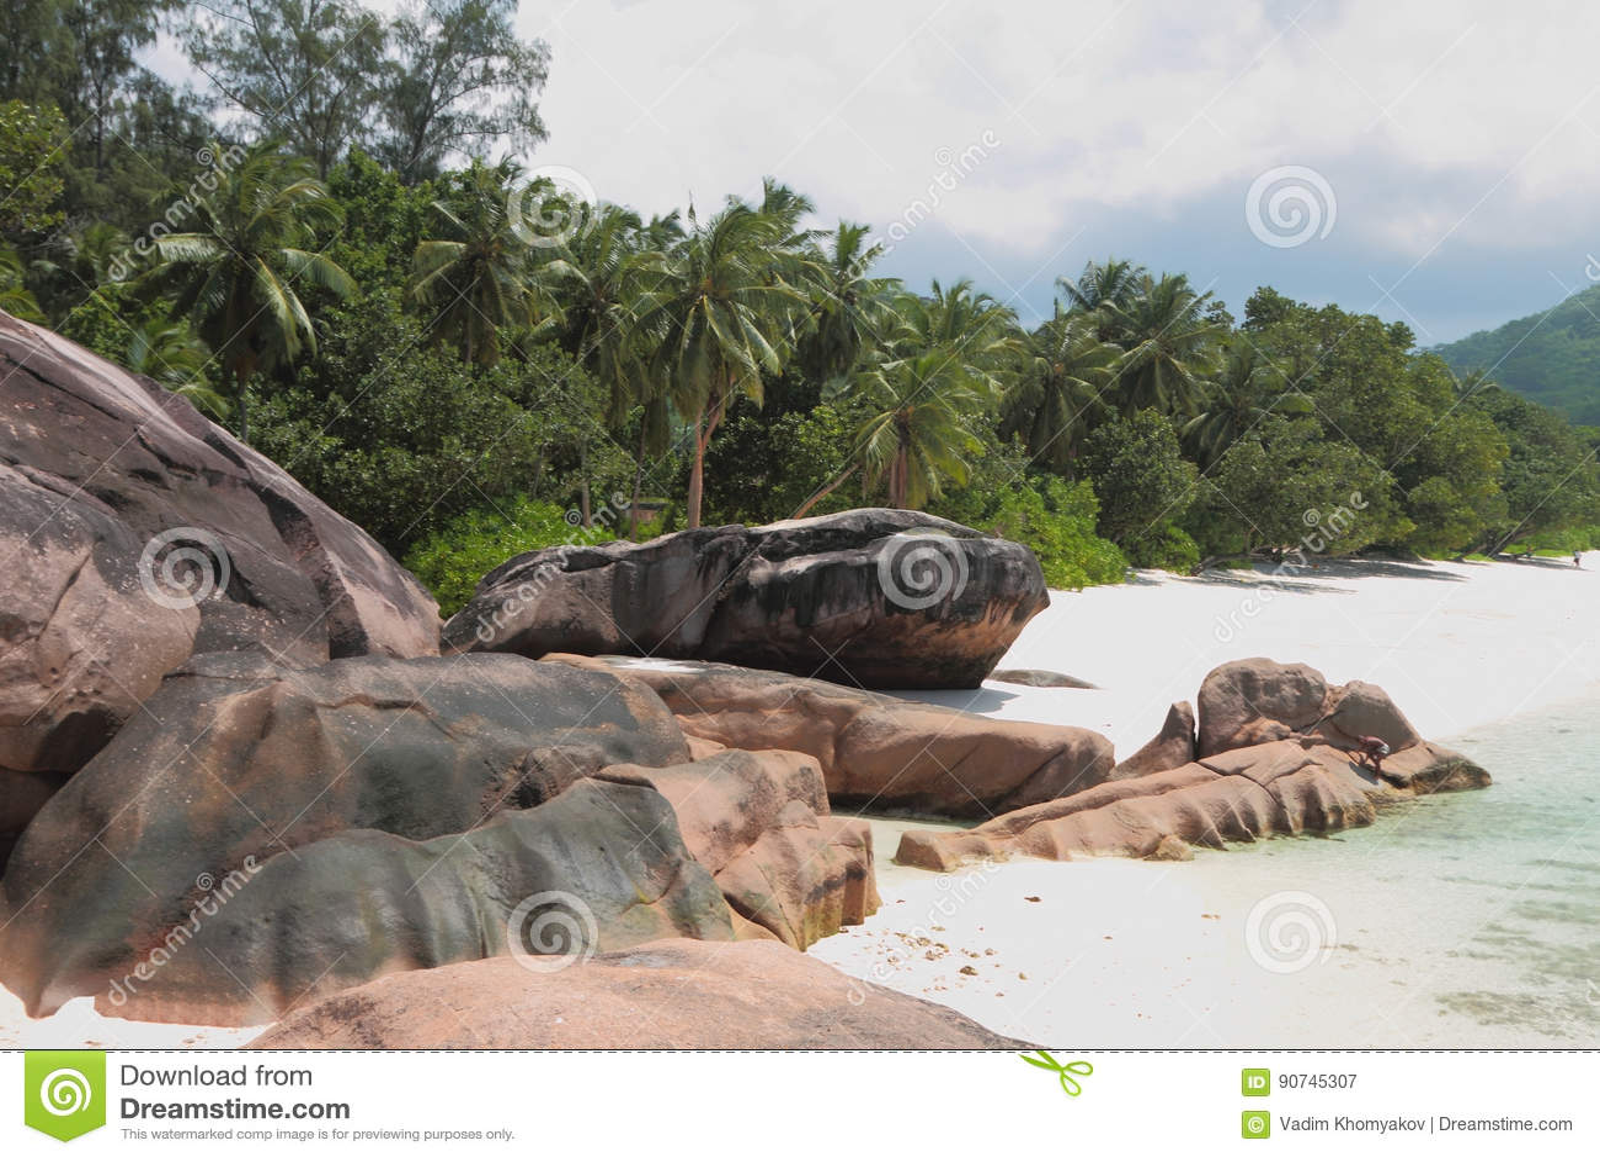 Pedregulhos do basalto no Sandy Beach Baie Lazare, Mahe, Seychelles